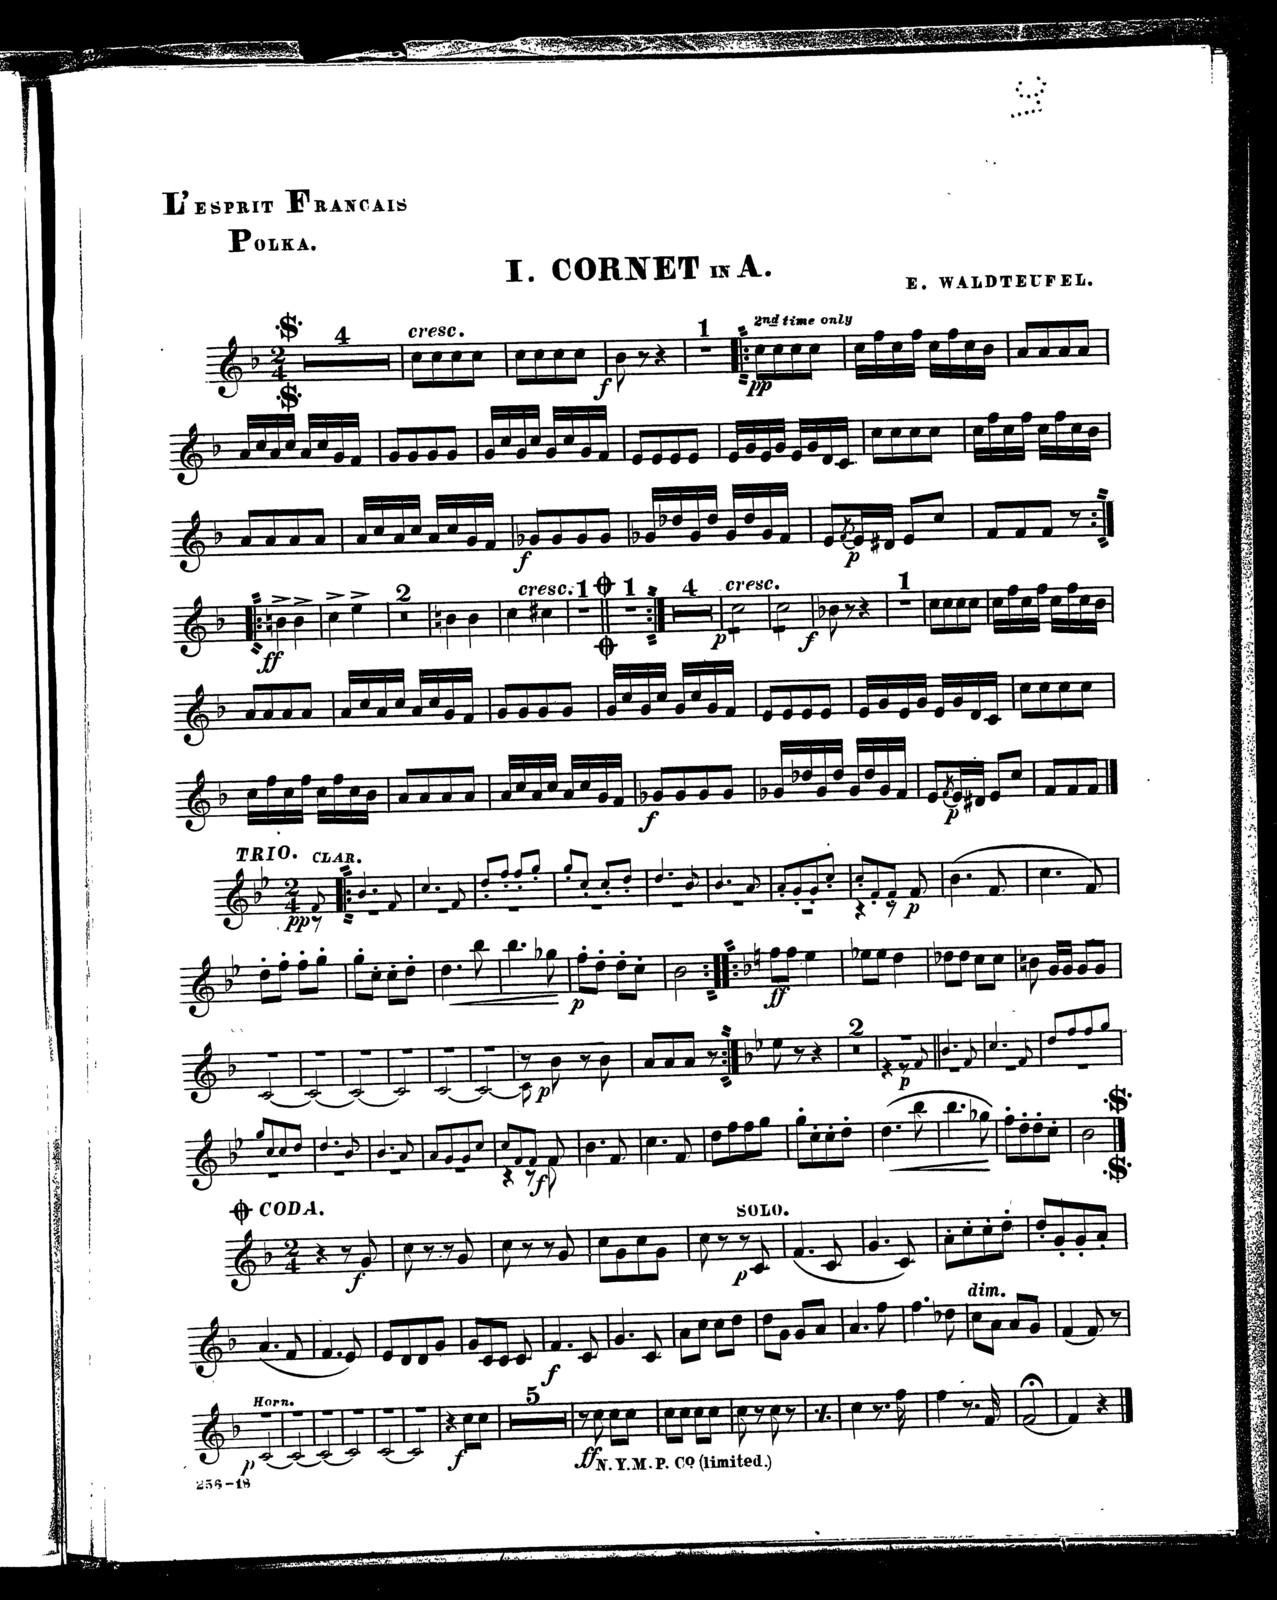 Forest sounds polka [and] L'Esprit Francais polka - PICRYL Public